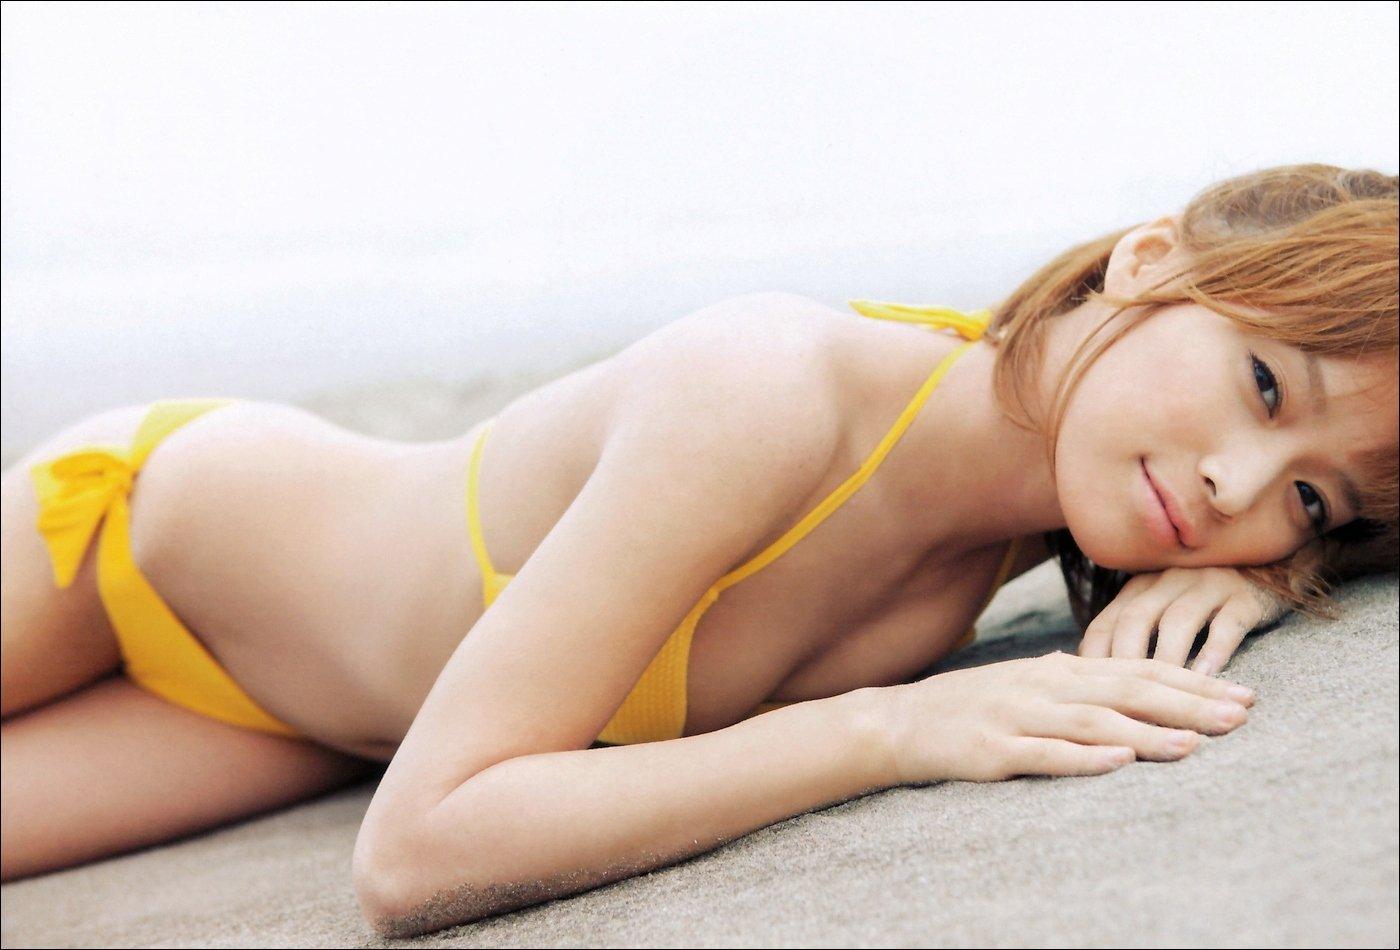 Eri Kamei: Milk Carton Musume